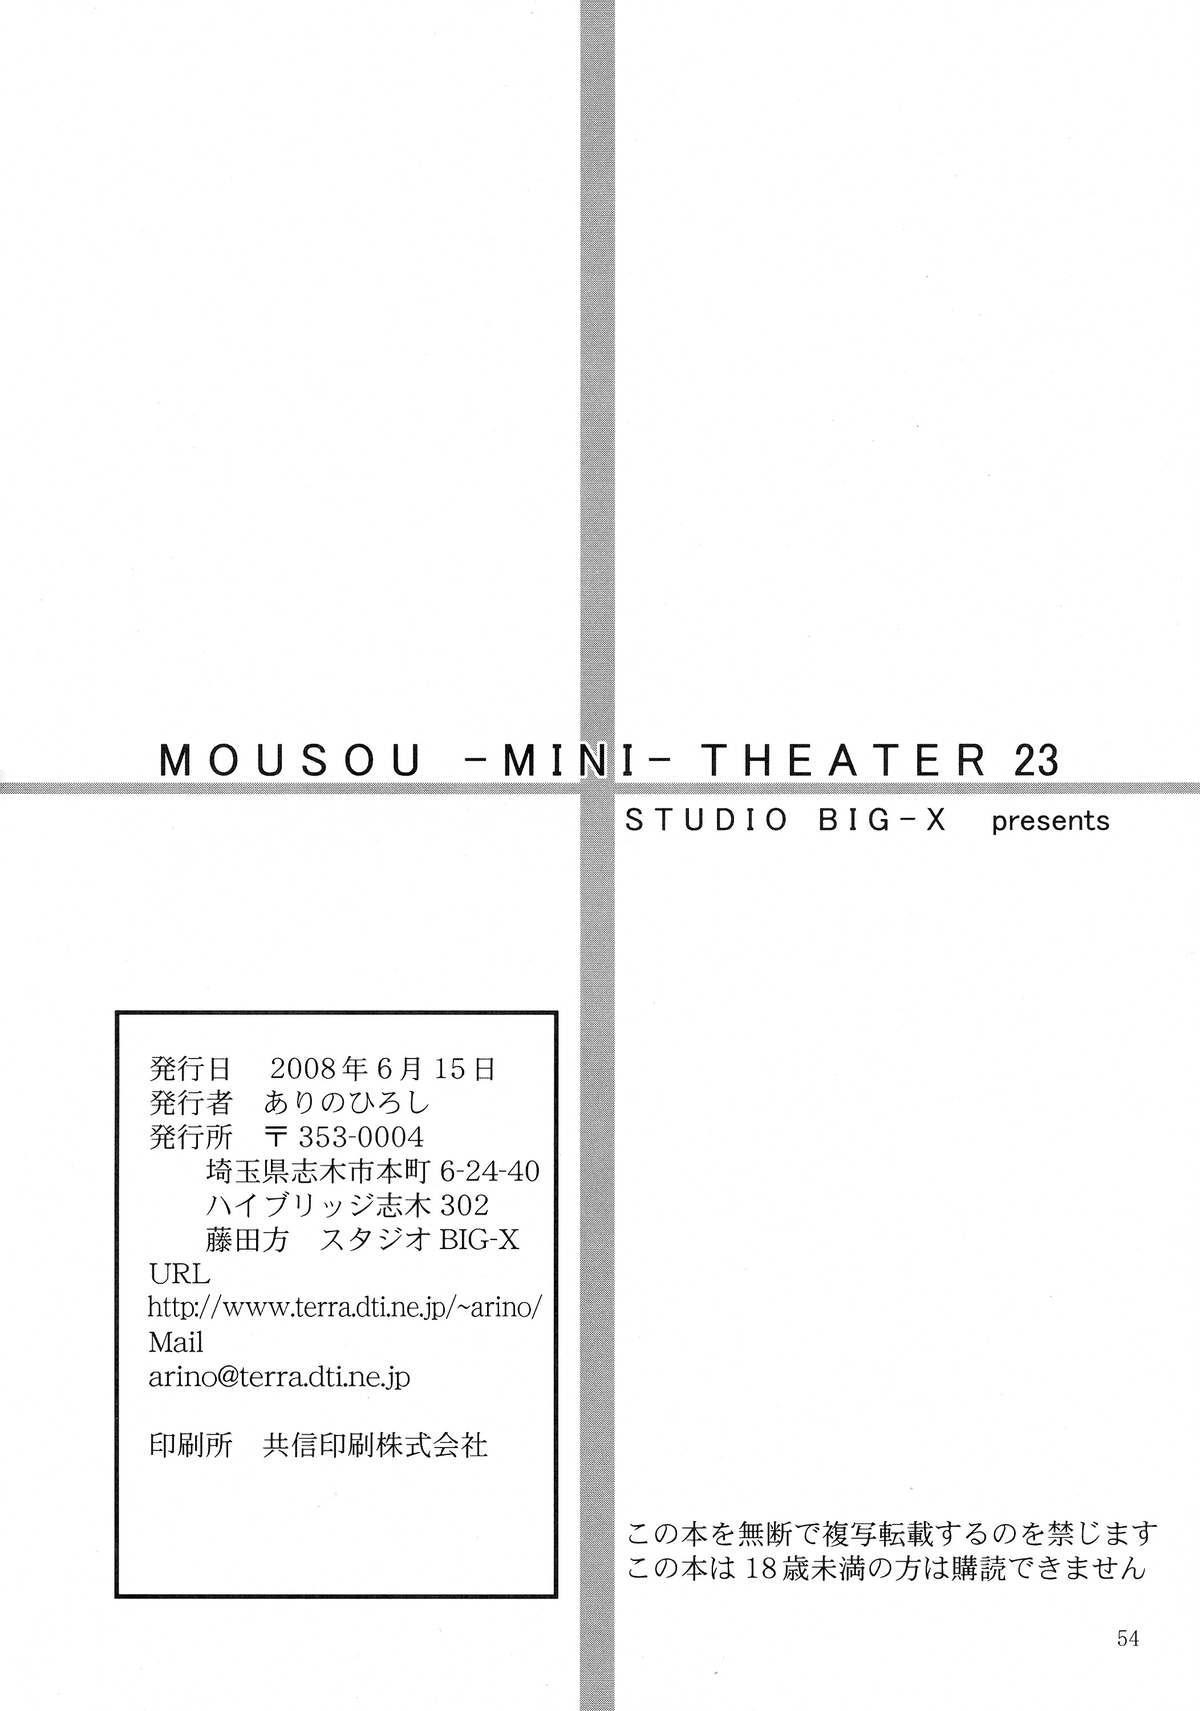 Mousou Mini Theater 23 53